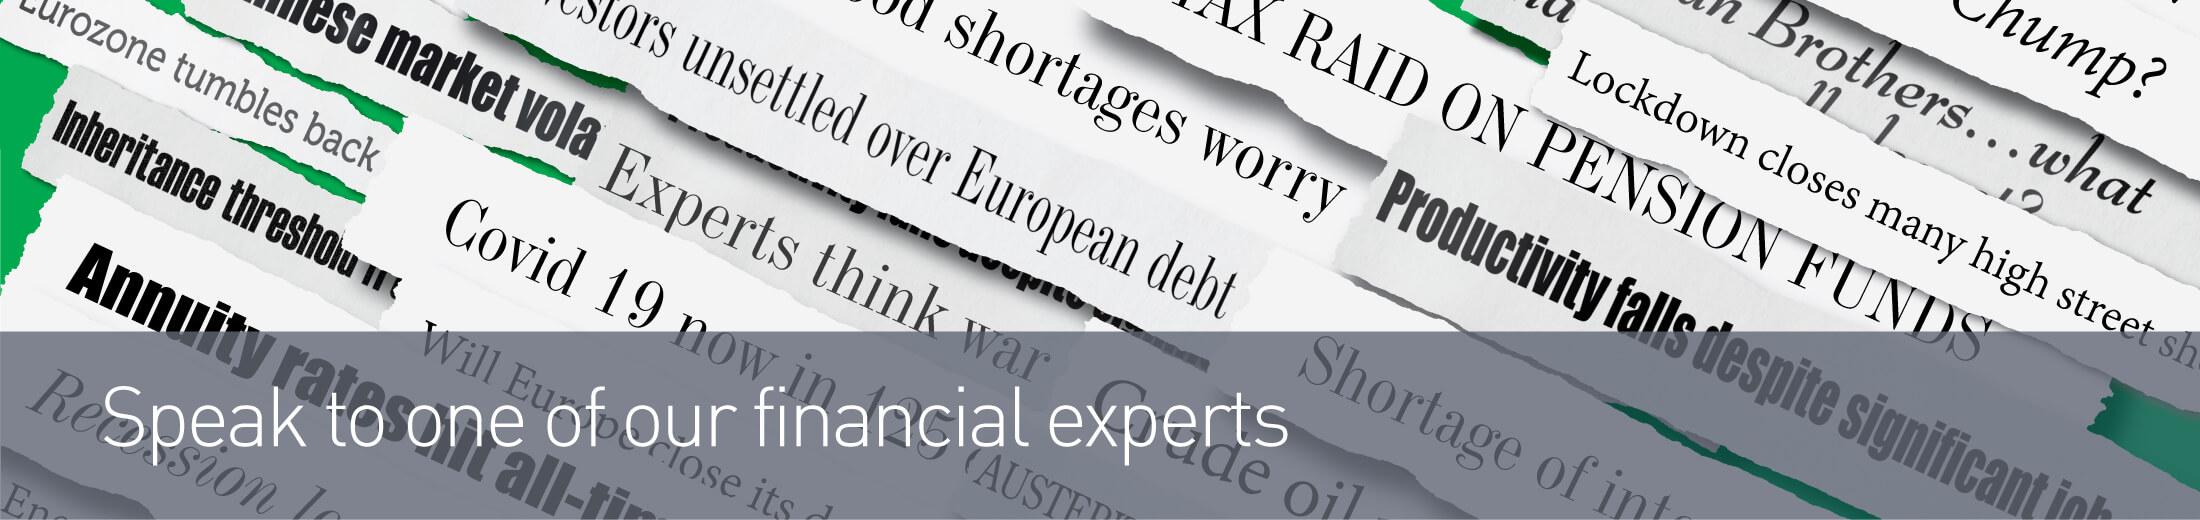 Speak to a financial expert